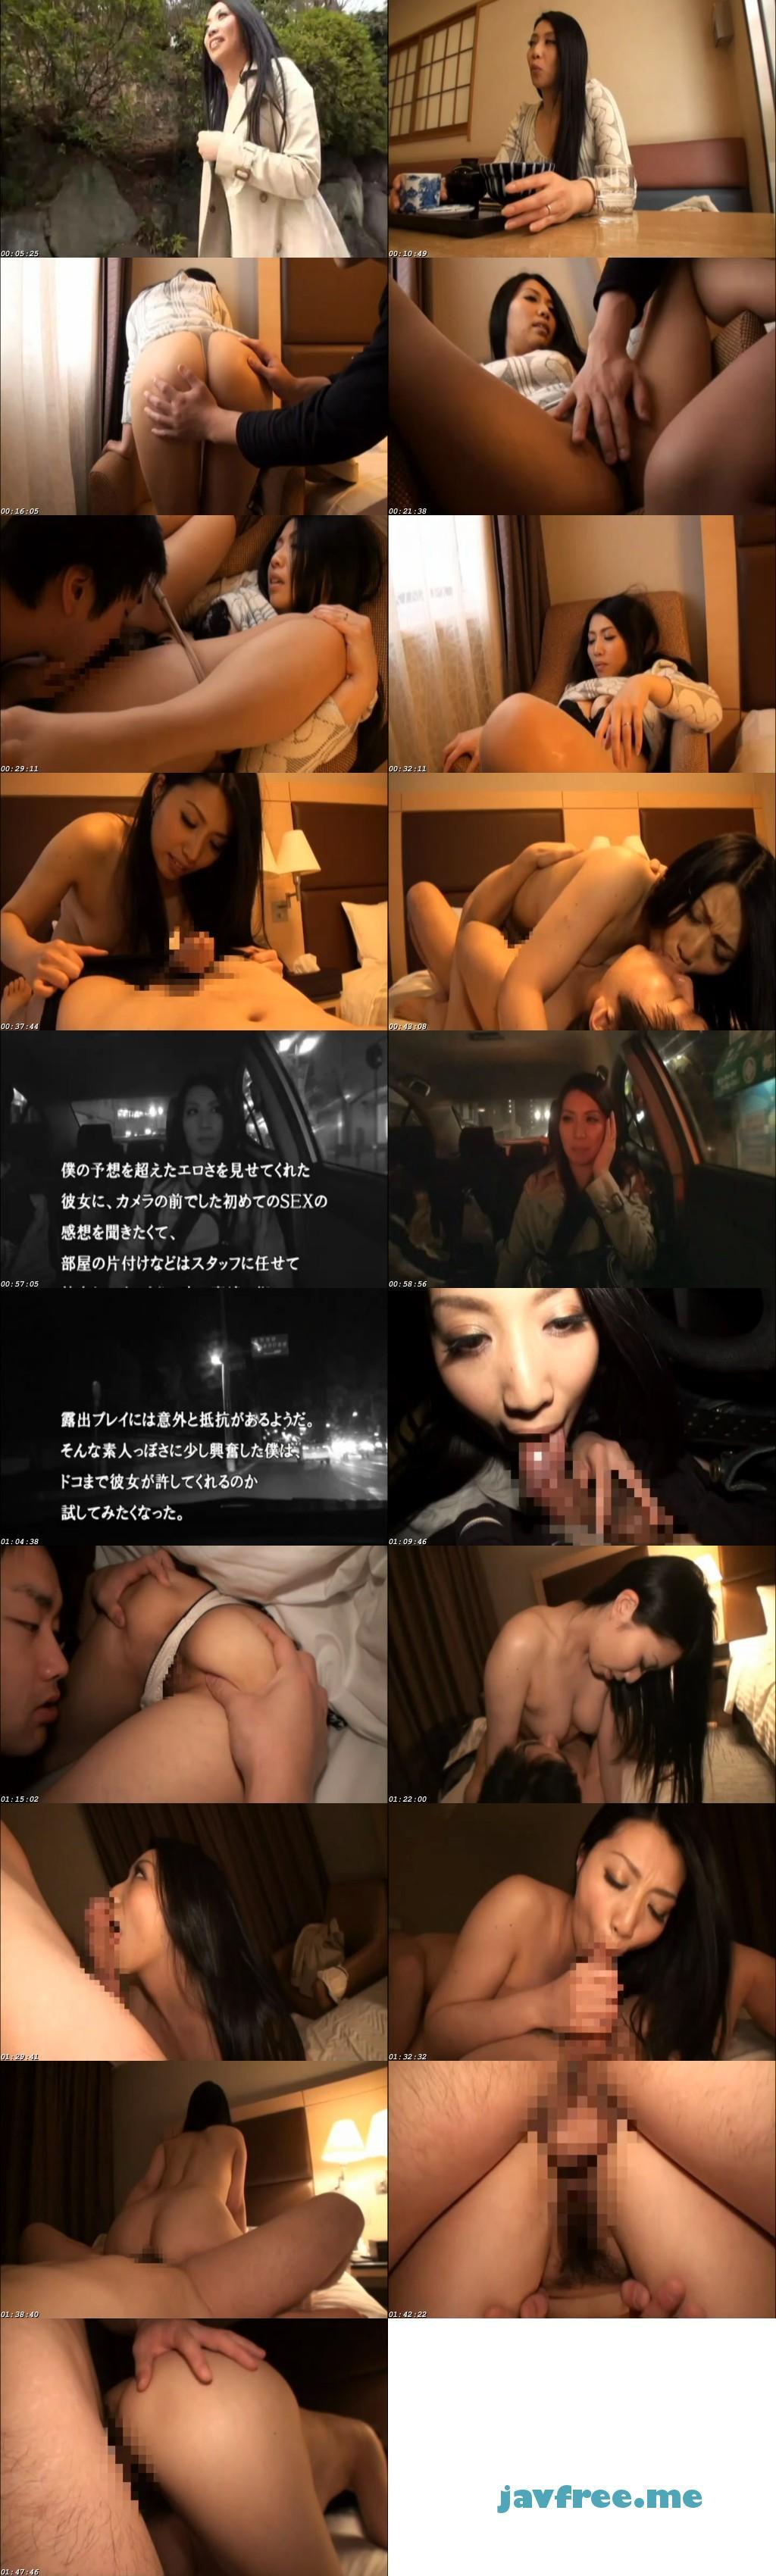 [GG 074] AVに出たがる地方人妻たち 2 つやこ 吉野艶子 GG